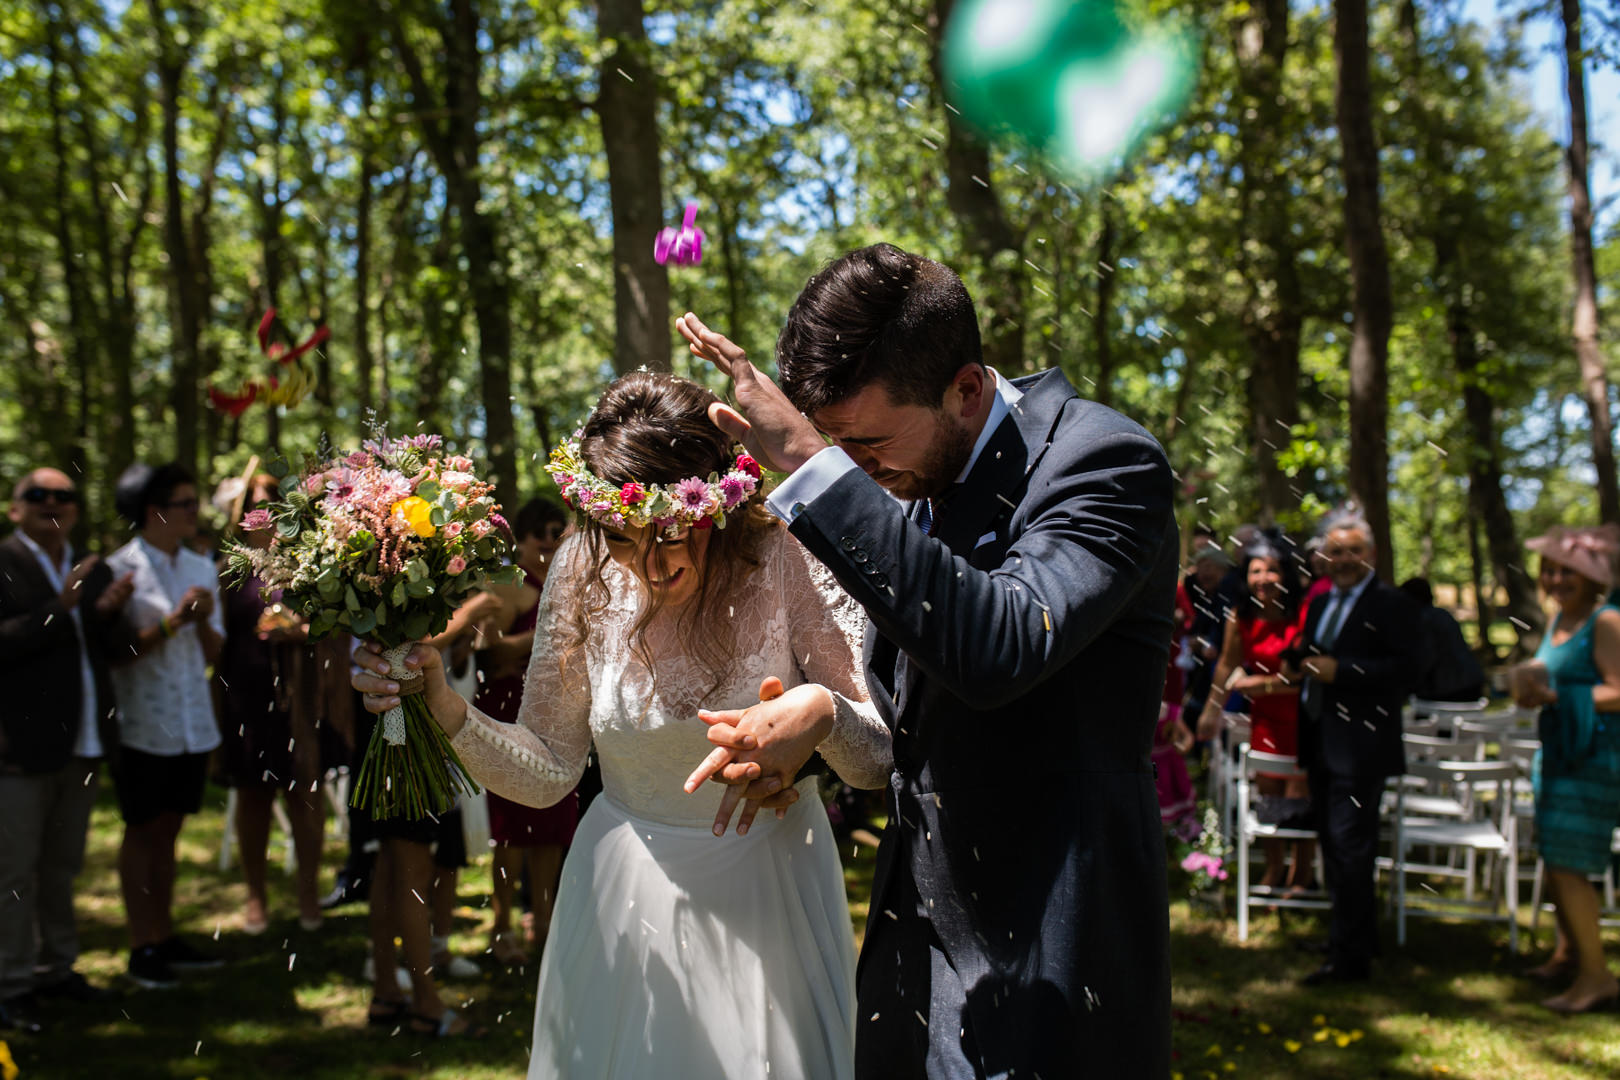 Boda-Lucia-Javi-Lugo-Rafael-Torres-fotografo-bodas-sevilla-madrid-barcelona-wedding-photographer--29.jpg